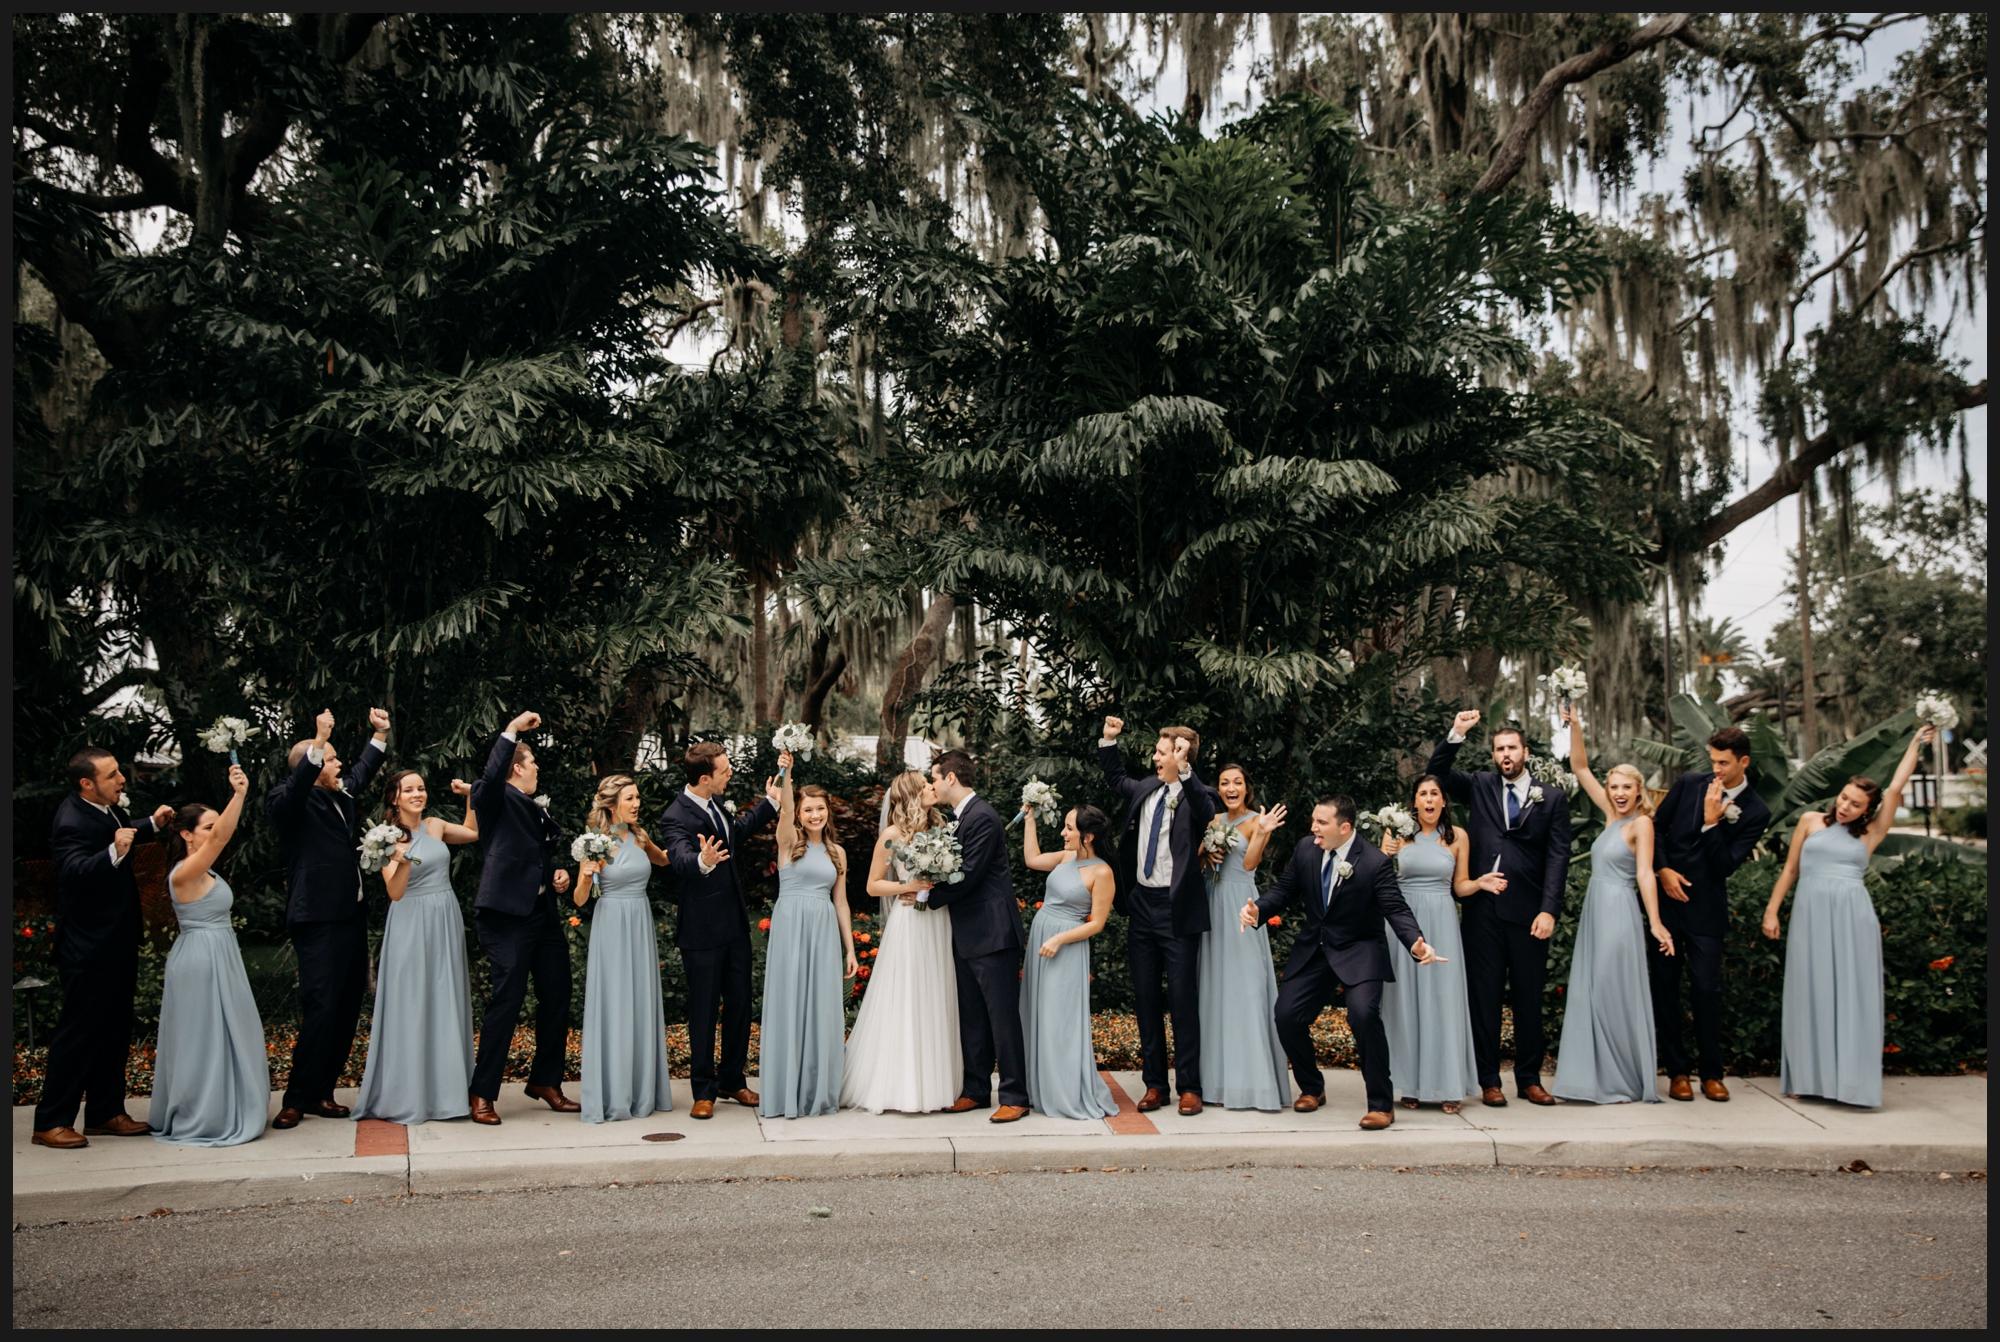 Orlando-Wedding-Photographer-destination-wedding-photographer-florida-wedding-photographer-bohemian-wedding-photographer_0281.jpg